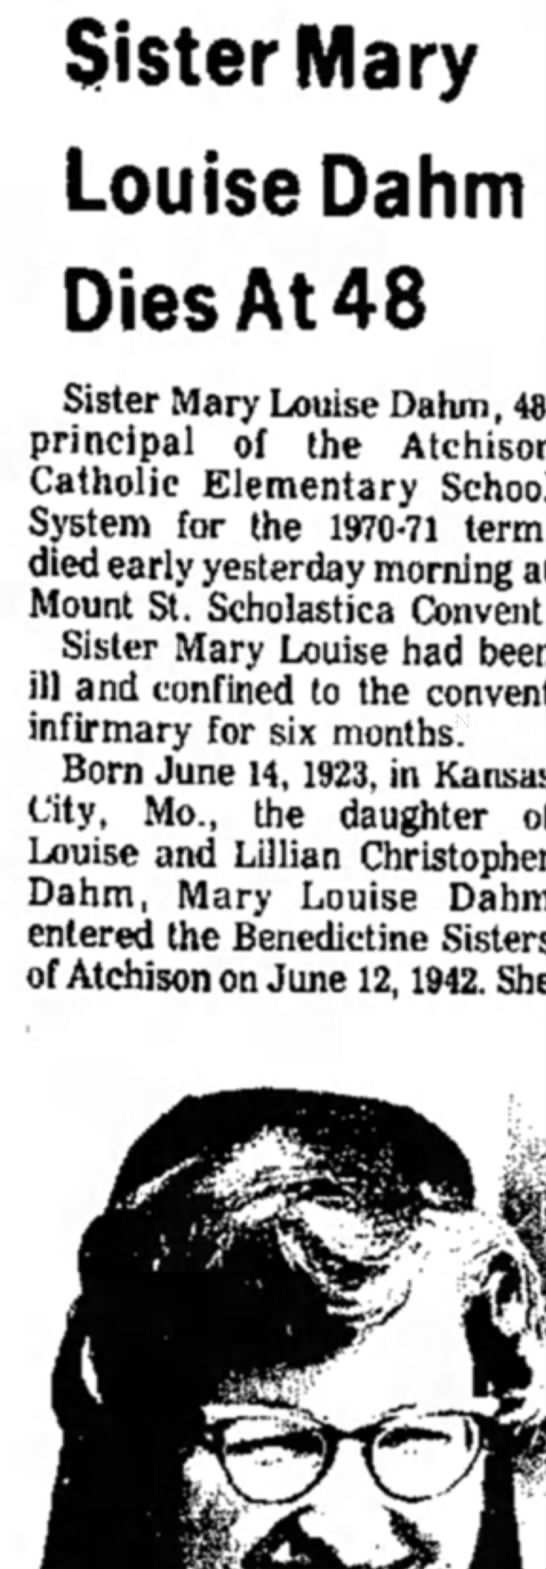 Sister Mary Louise Dahm 1972 -